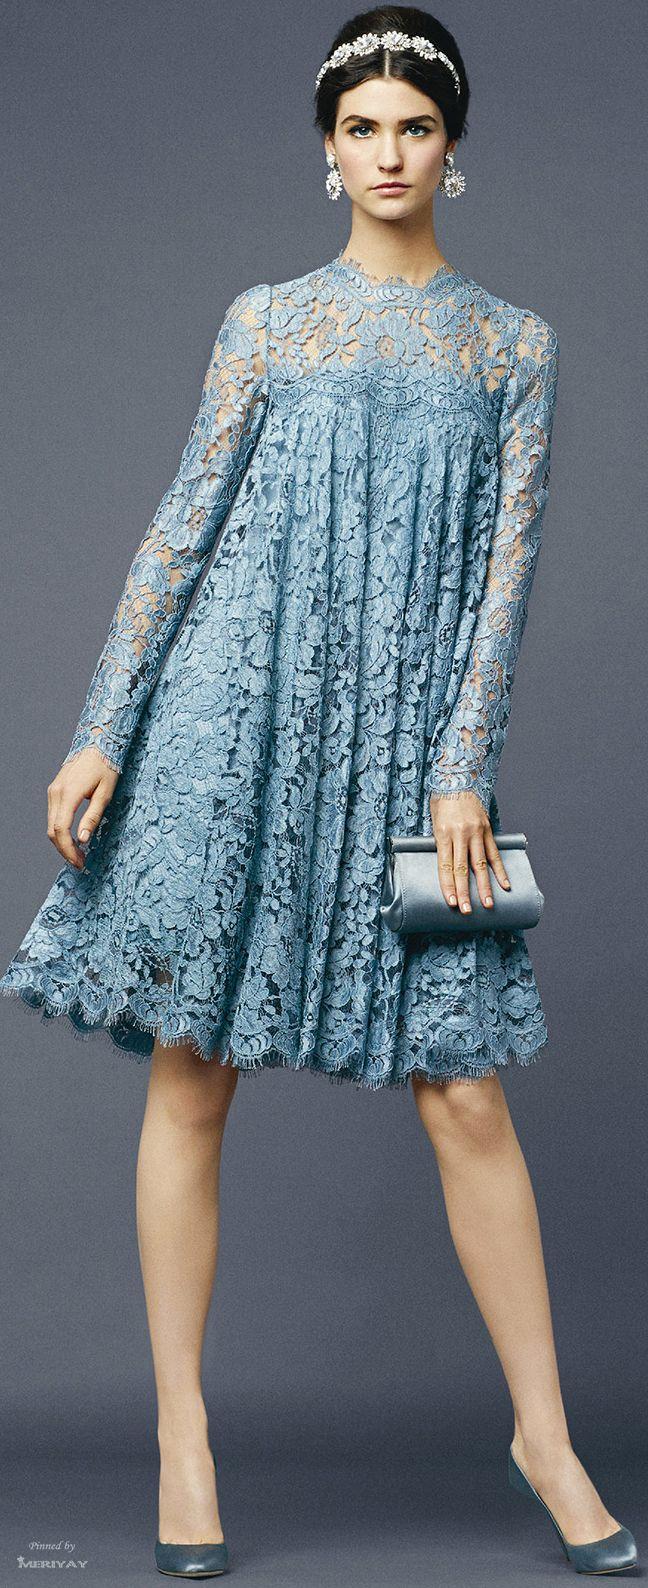 Dolce and Gabbana ss 2014 Beautifuls.com Members VIP Fashion Club 40-80% Off…